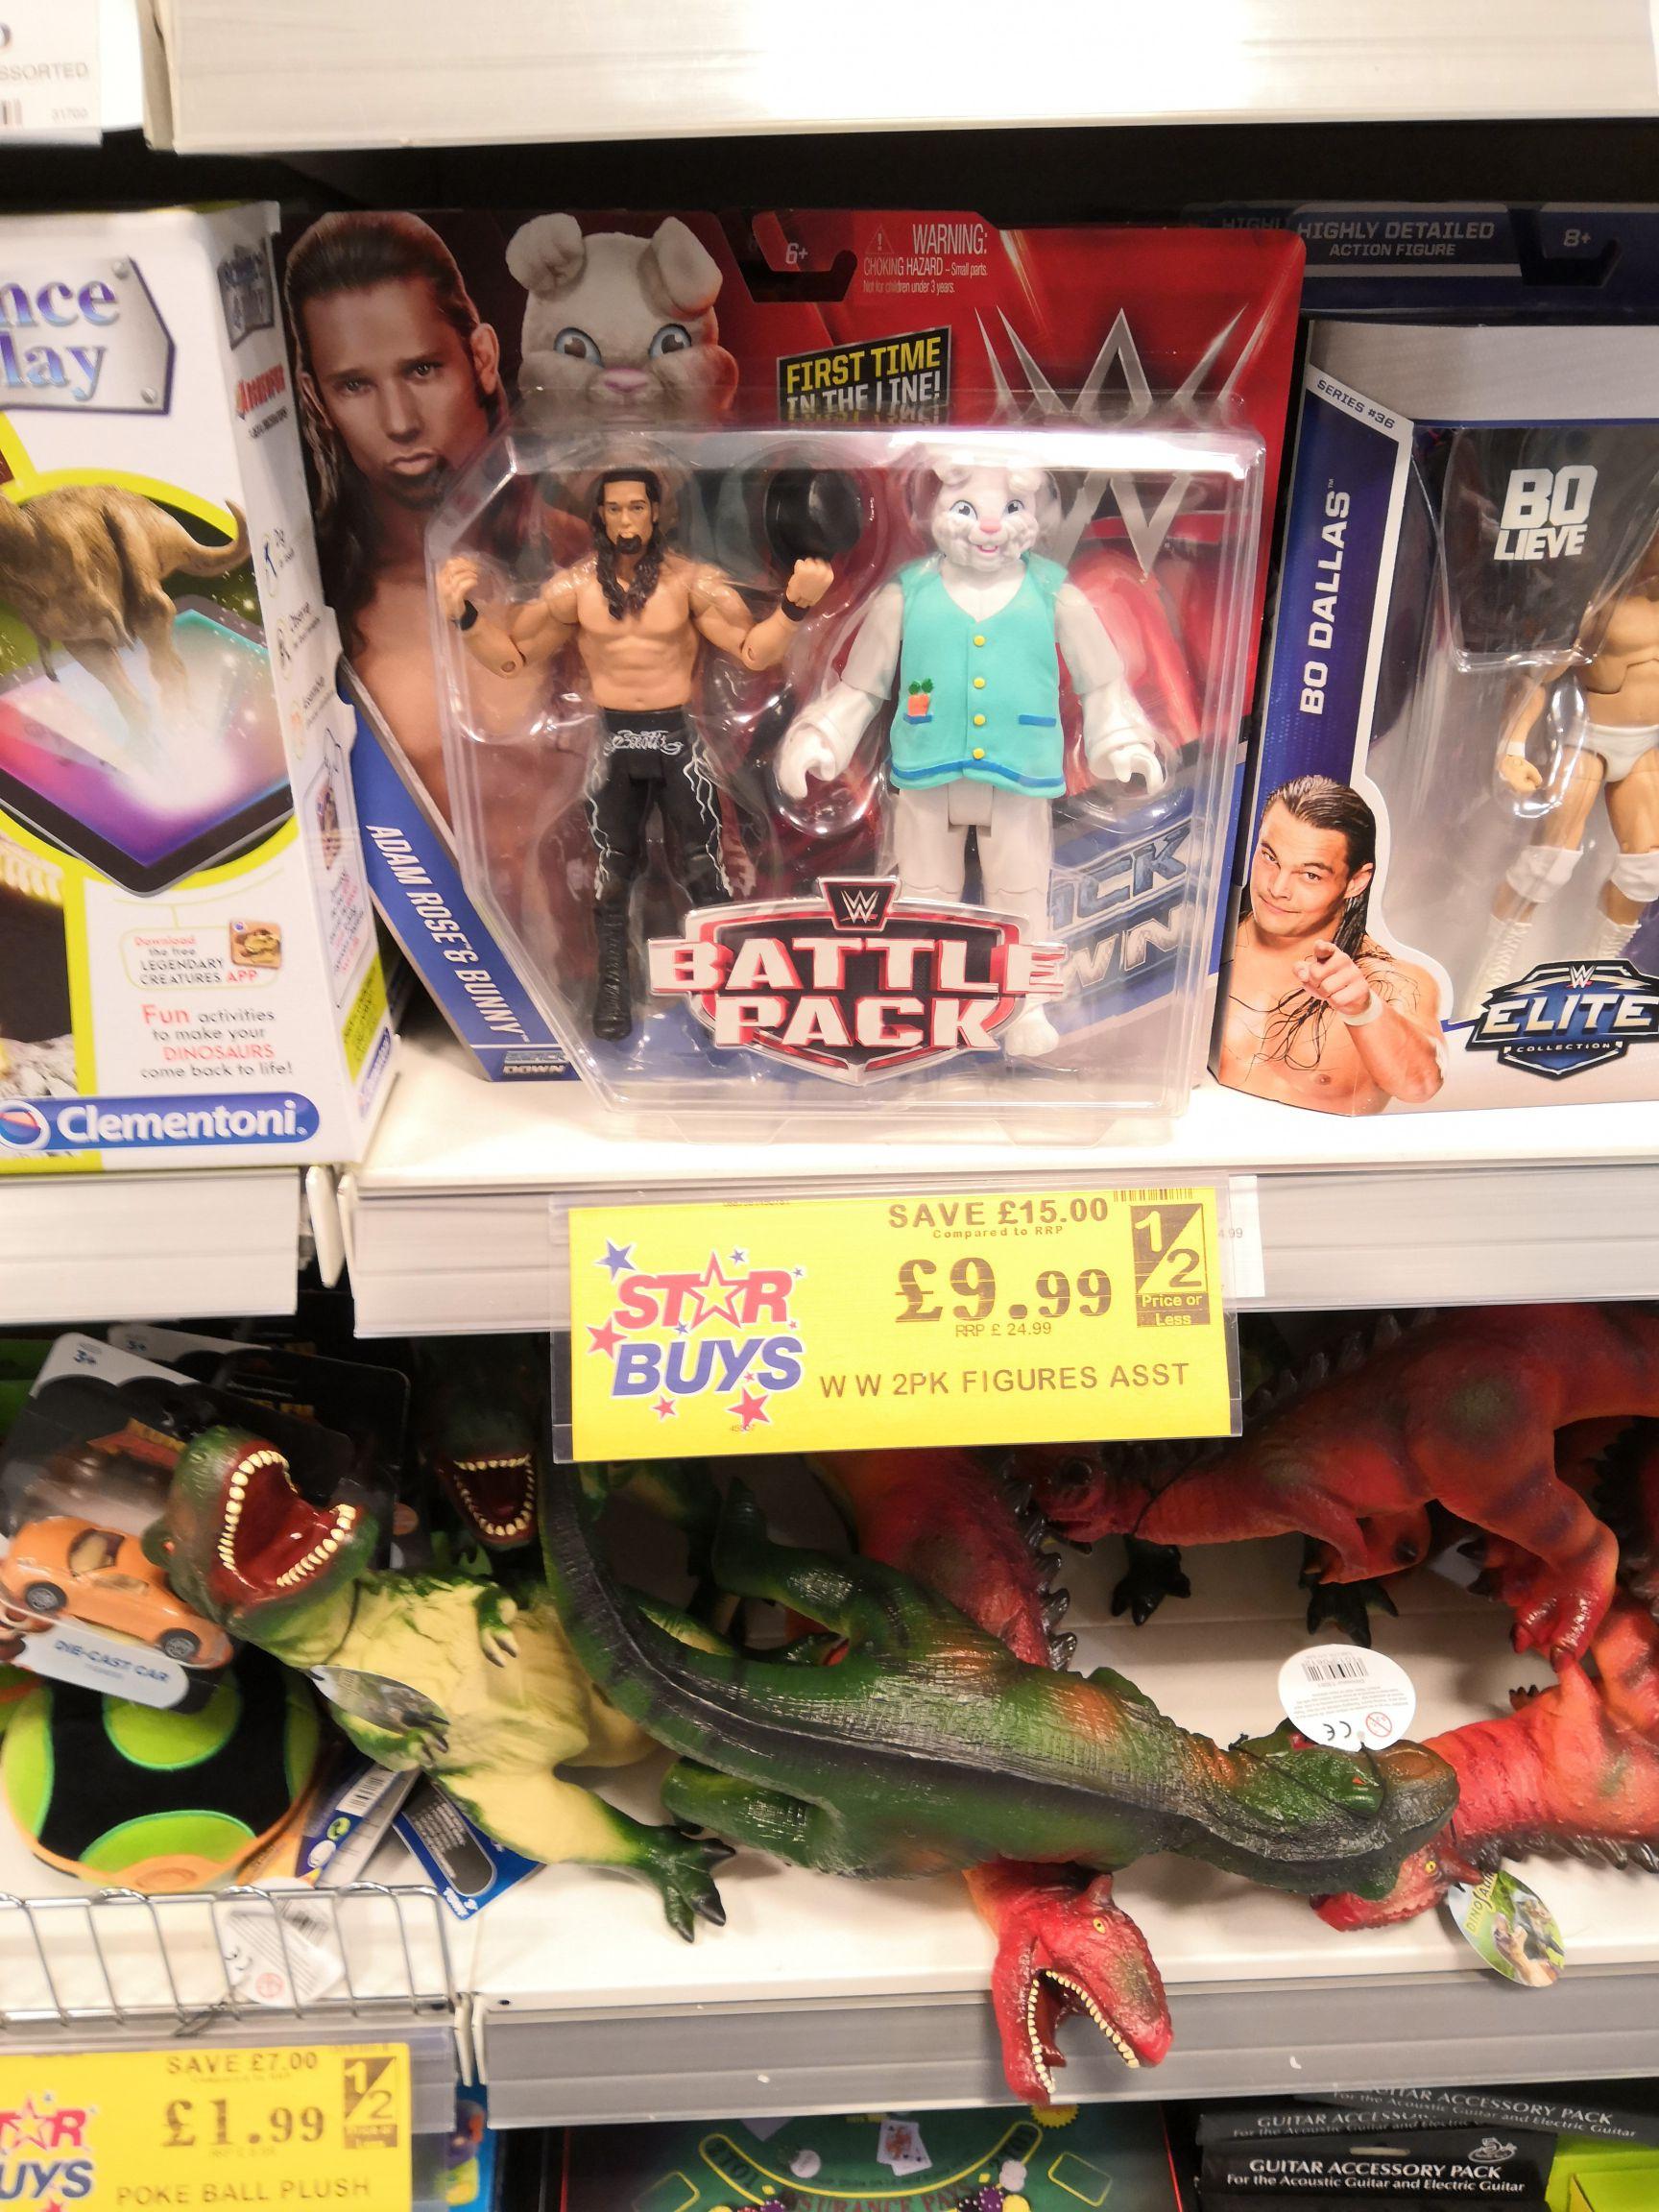 Wwe battle pack 2 figures @ homebargains prenton / wirral